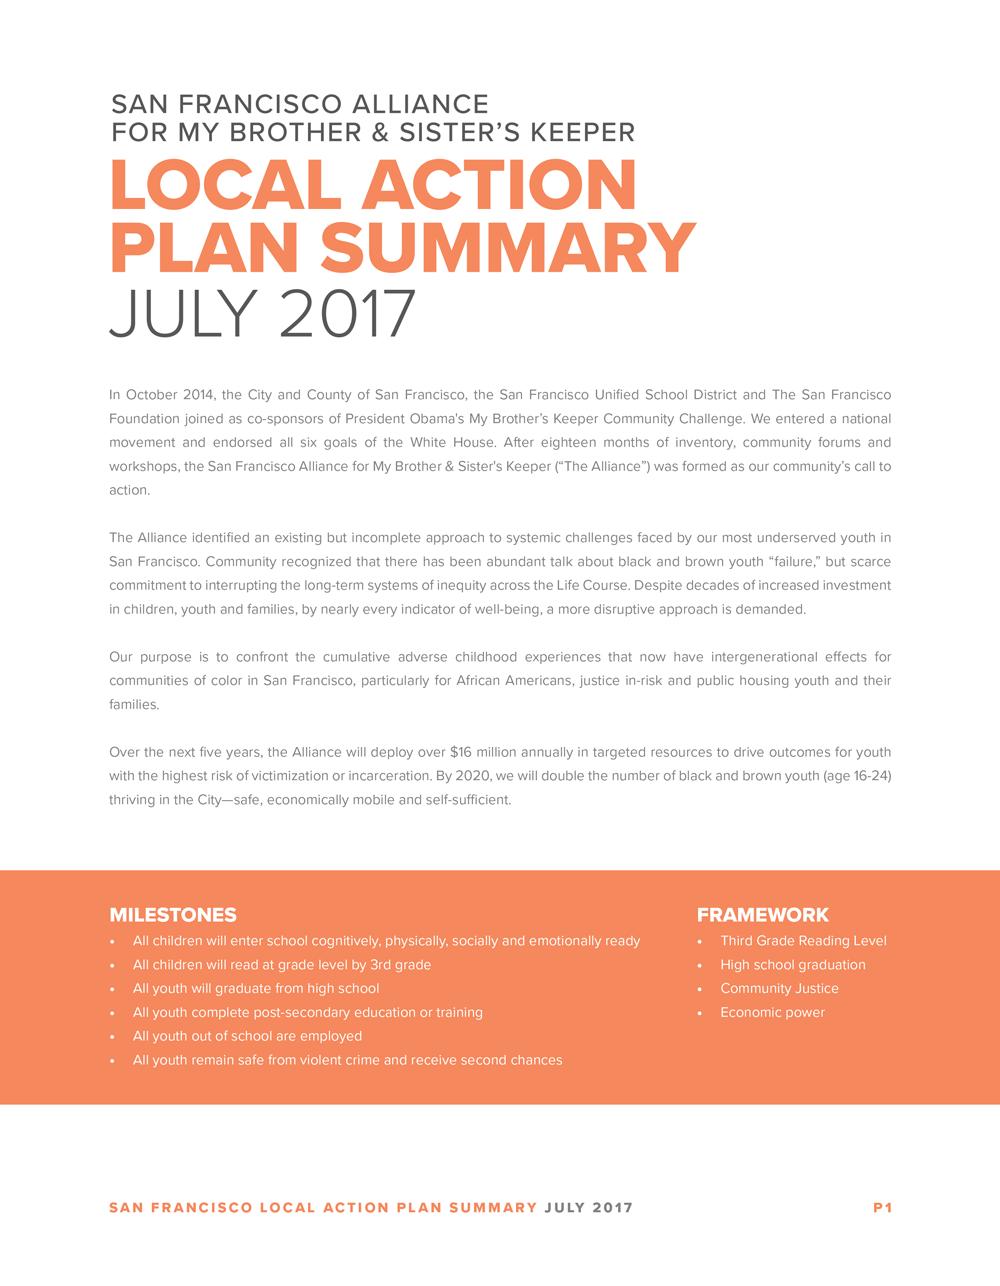 MBSKSF_LocalActionPlan_2017-02.png